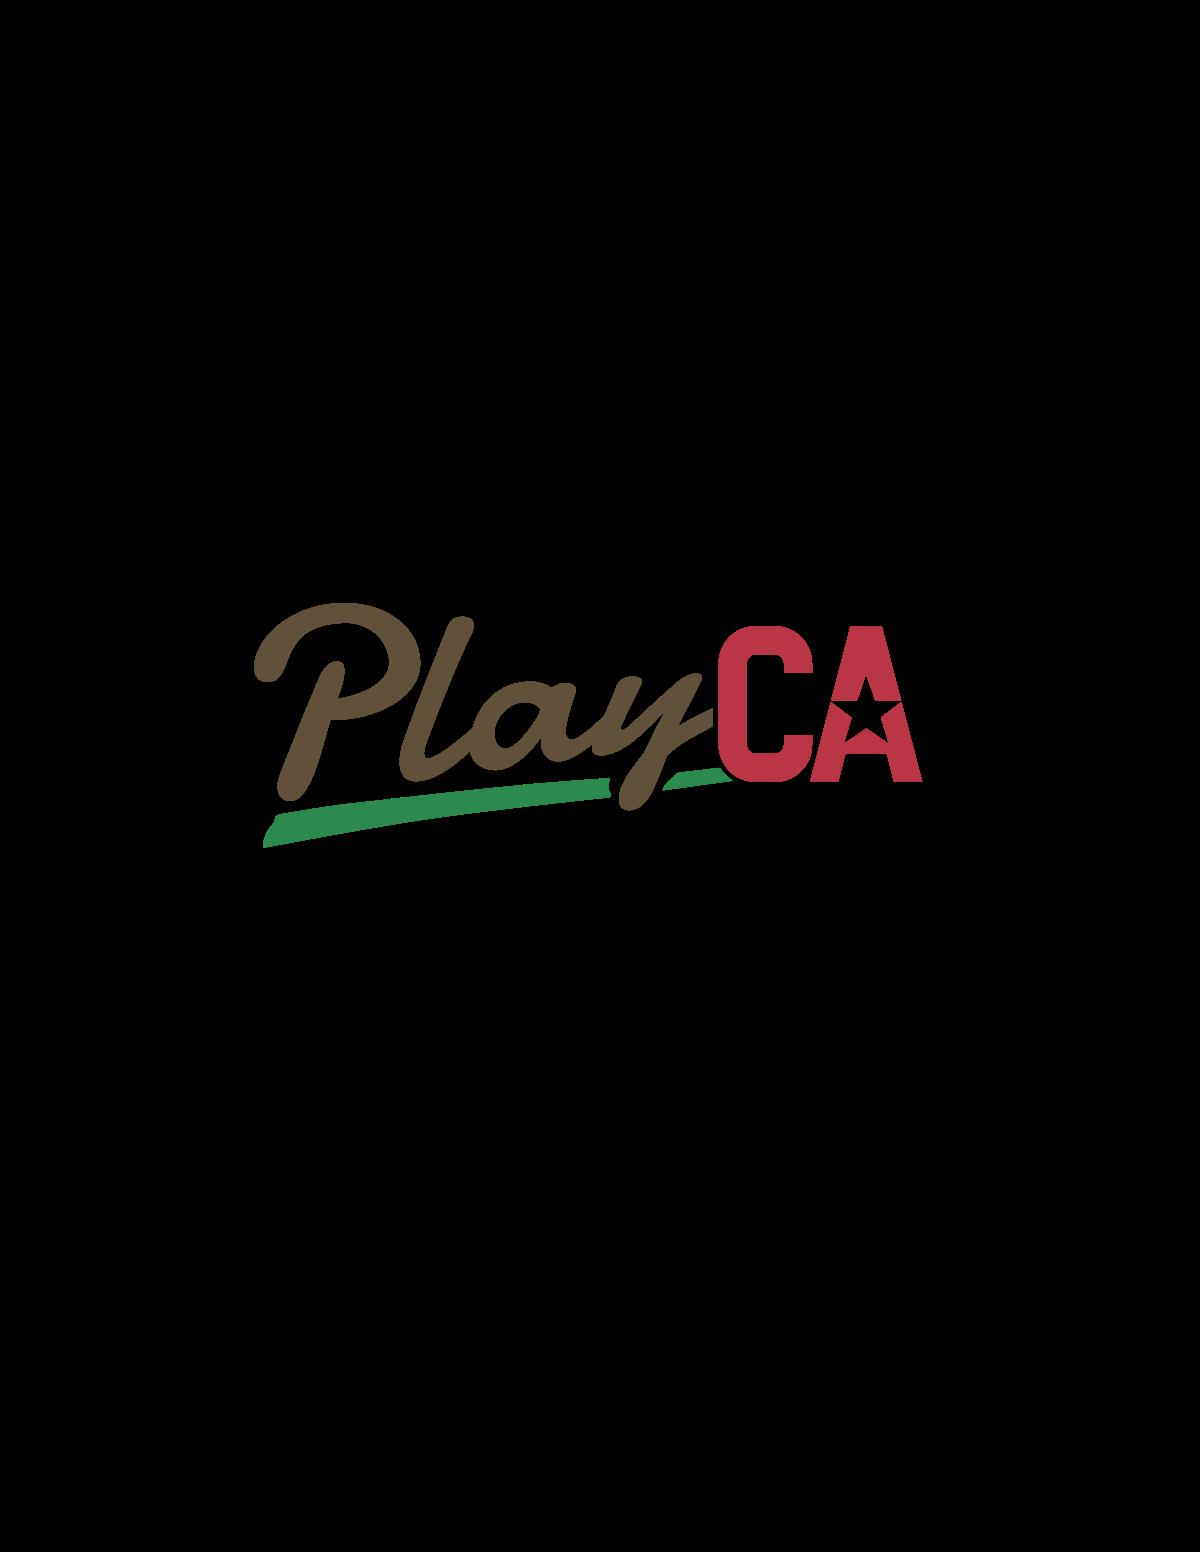 PlayCA